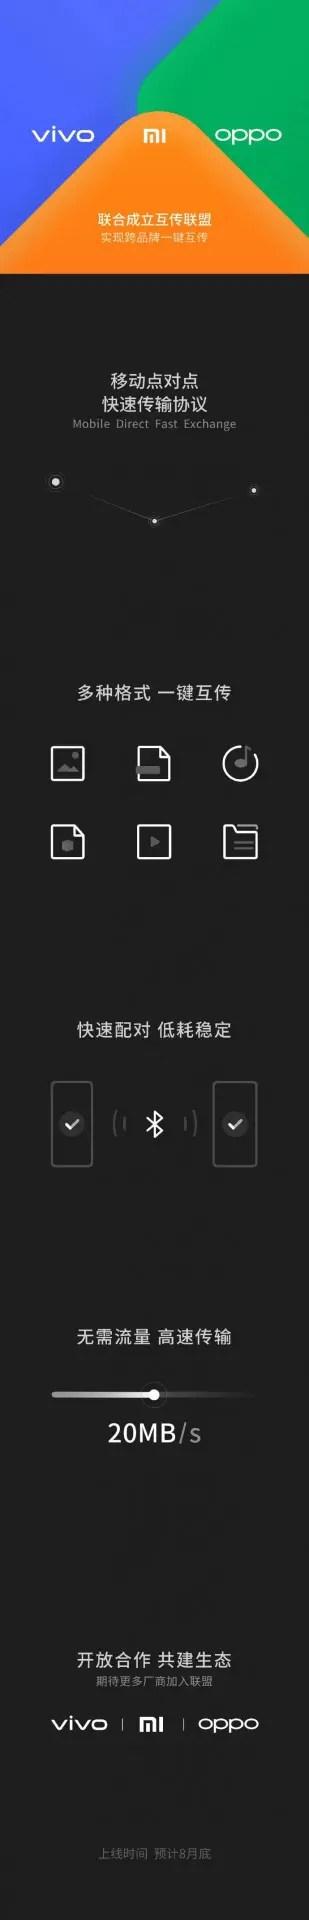 Xiaomi OPPO Vivo